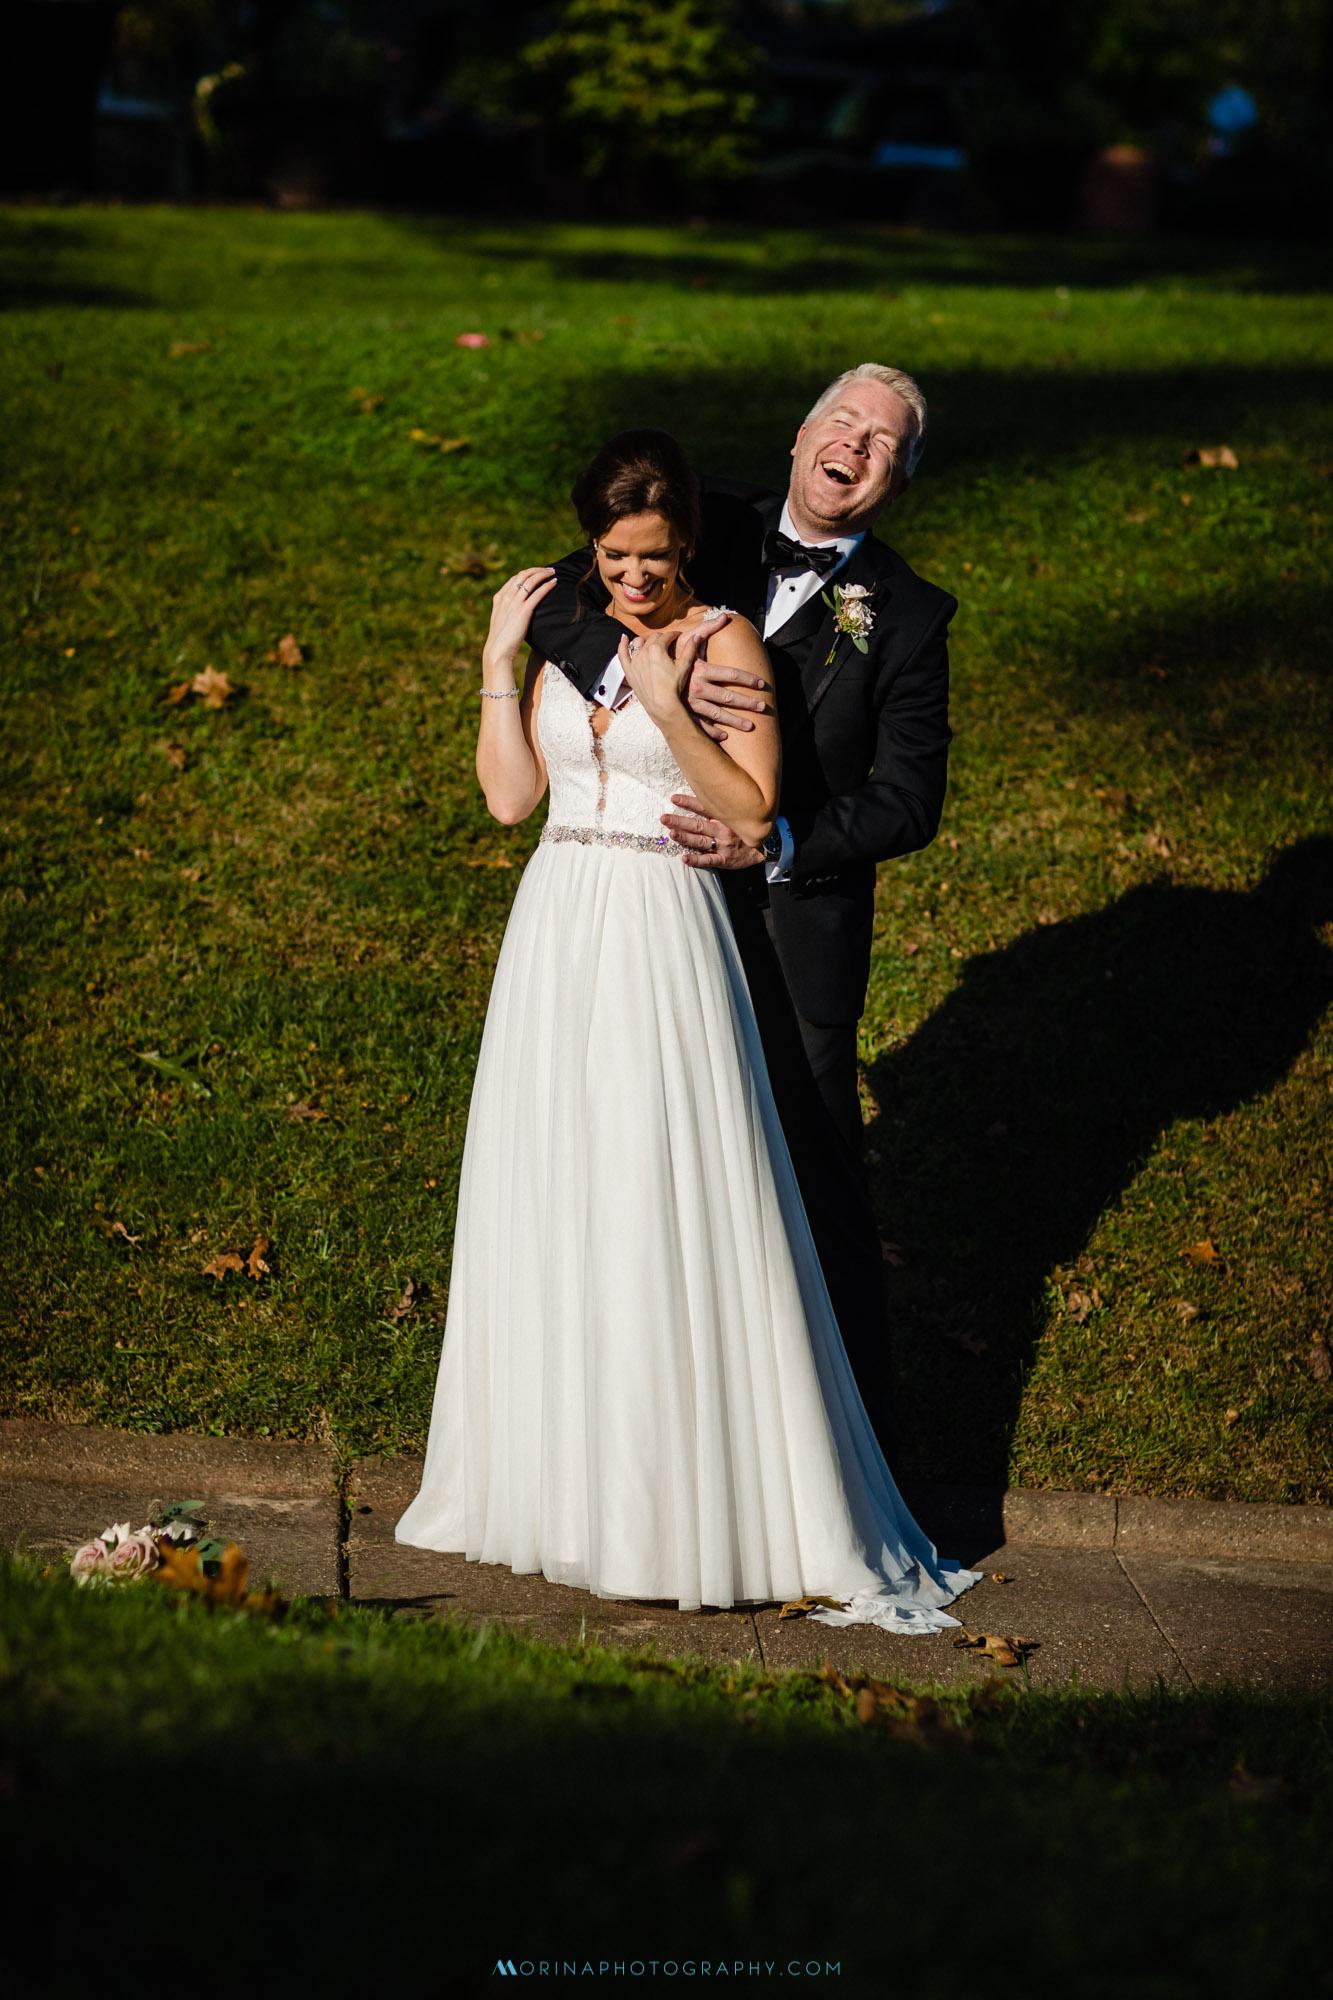 Colleen & Bill Wedding at Manufacturers' Golf & Country Club wedding 0057.jpg